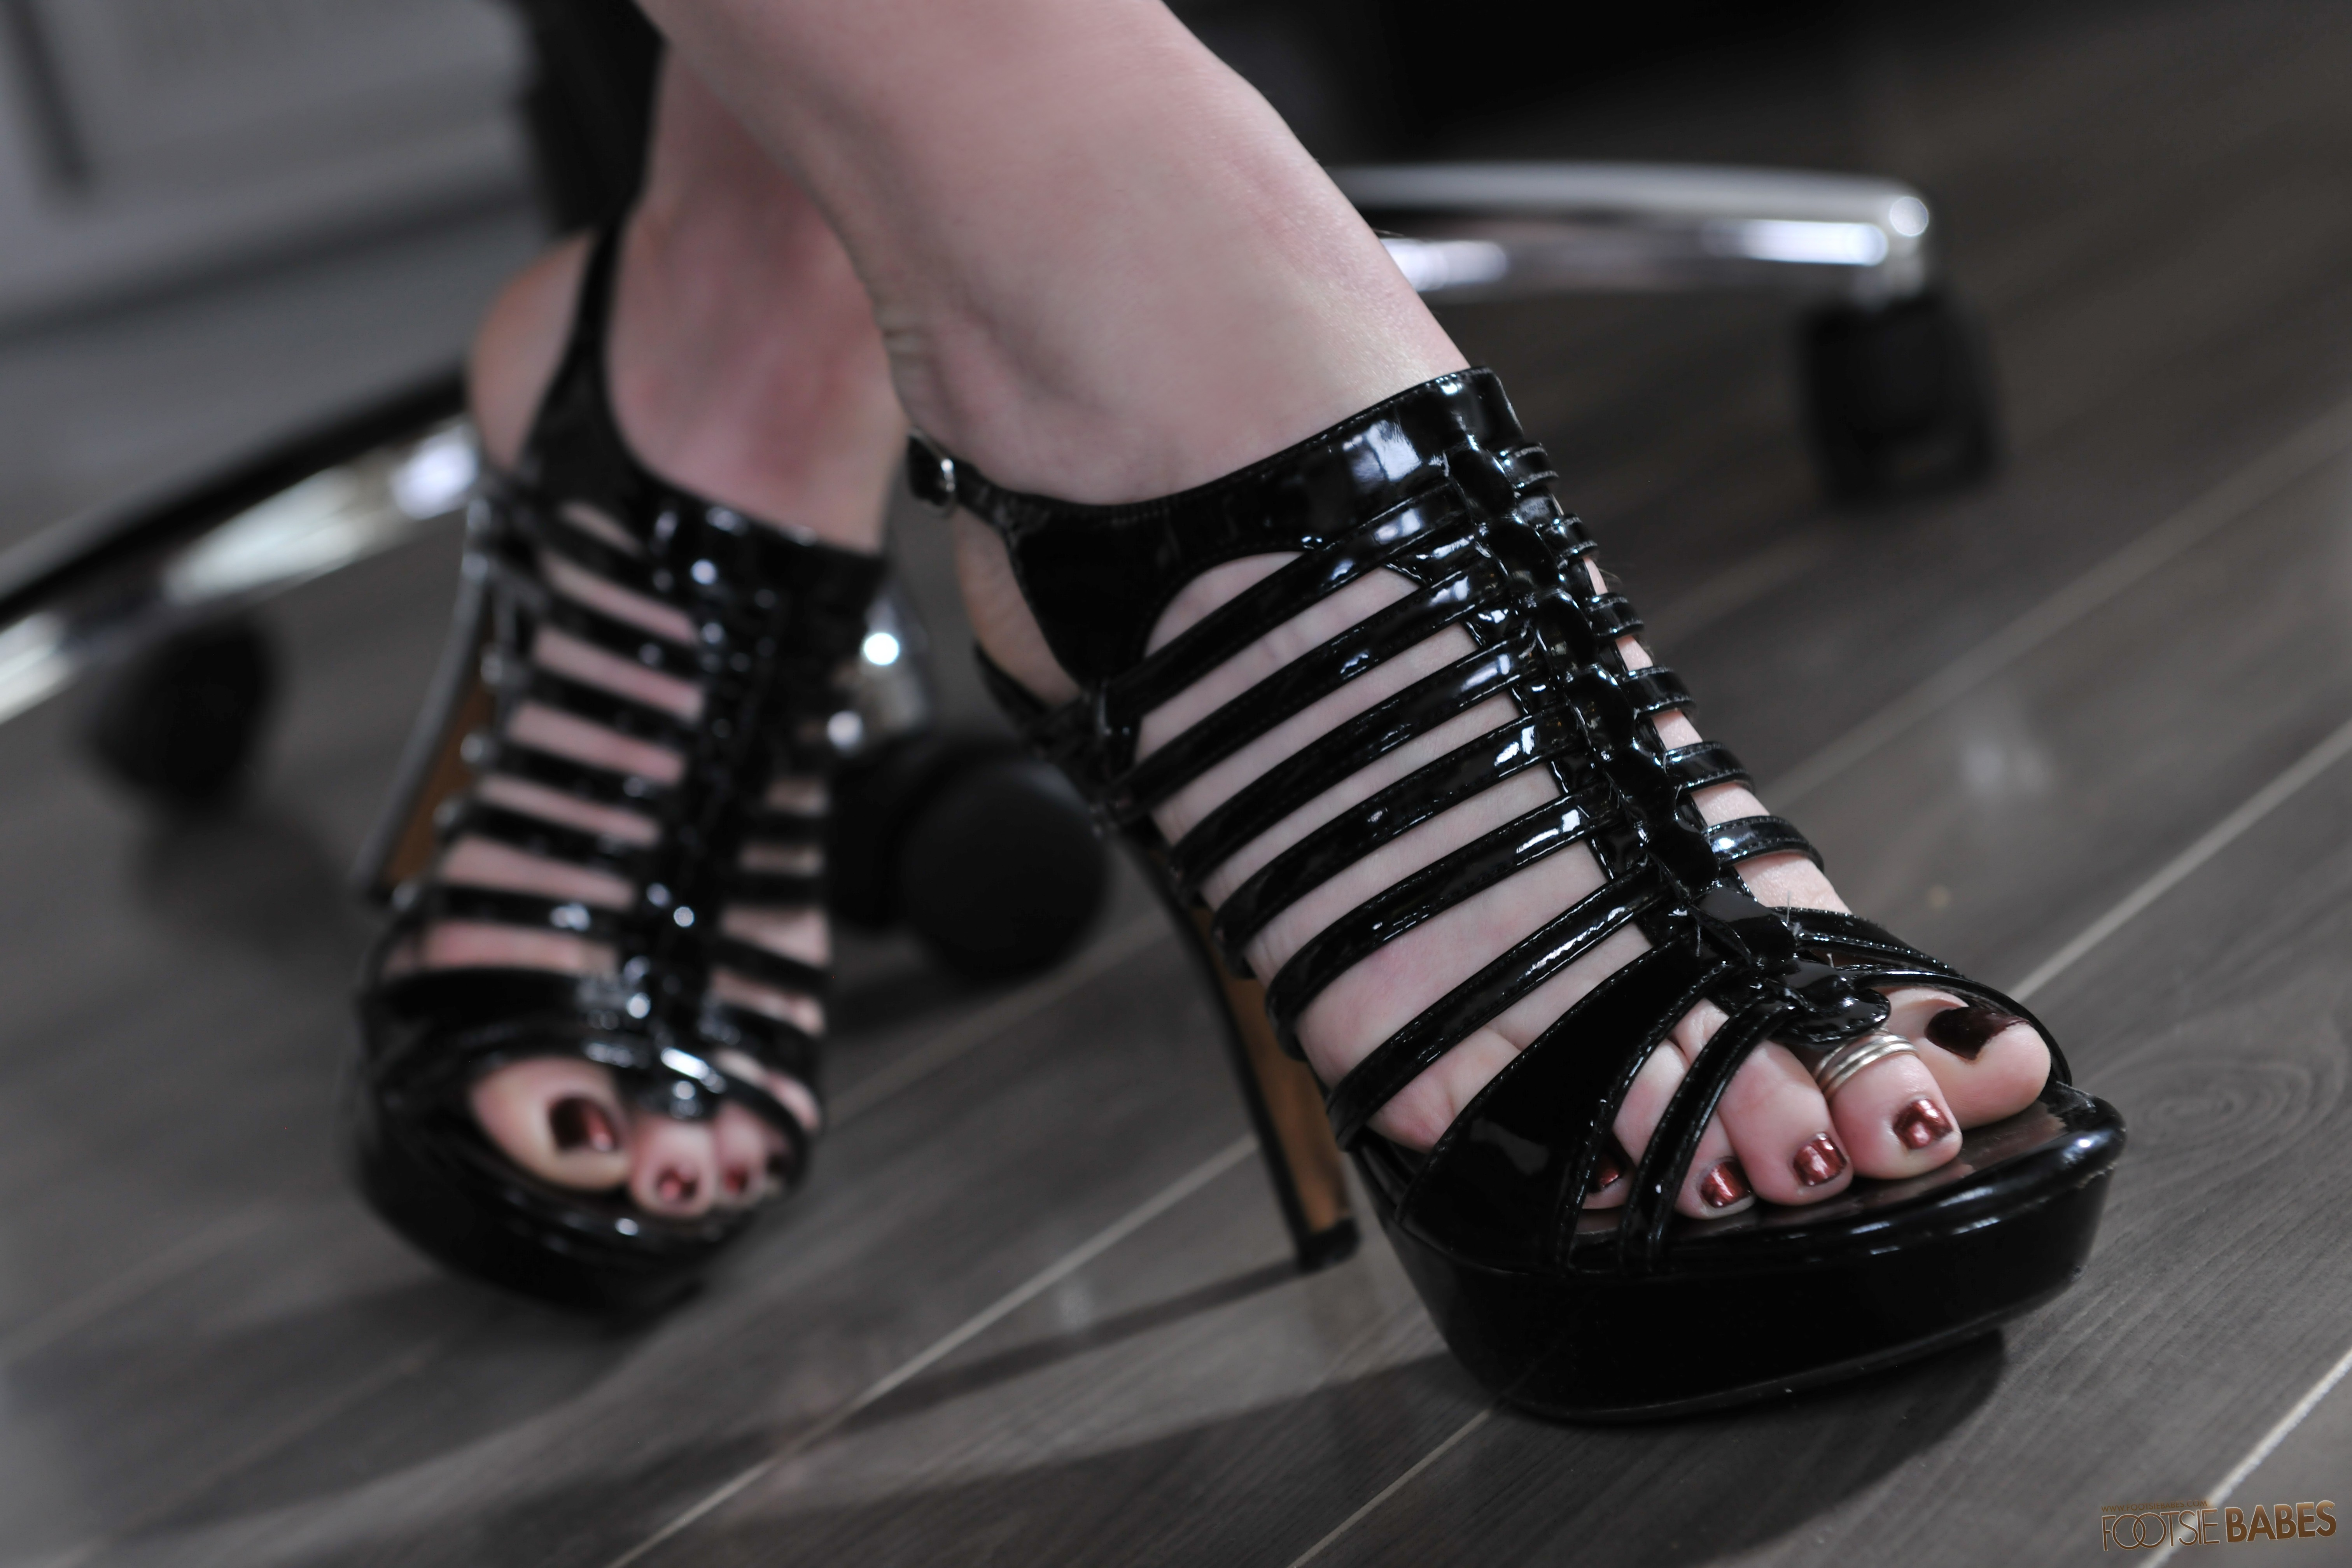 Rayveness foot